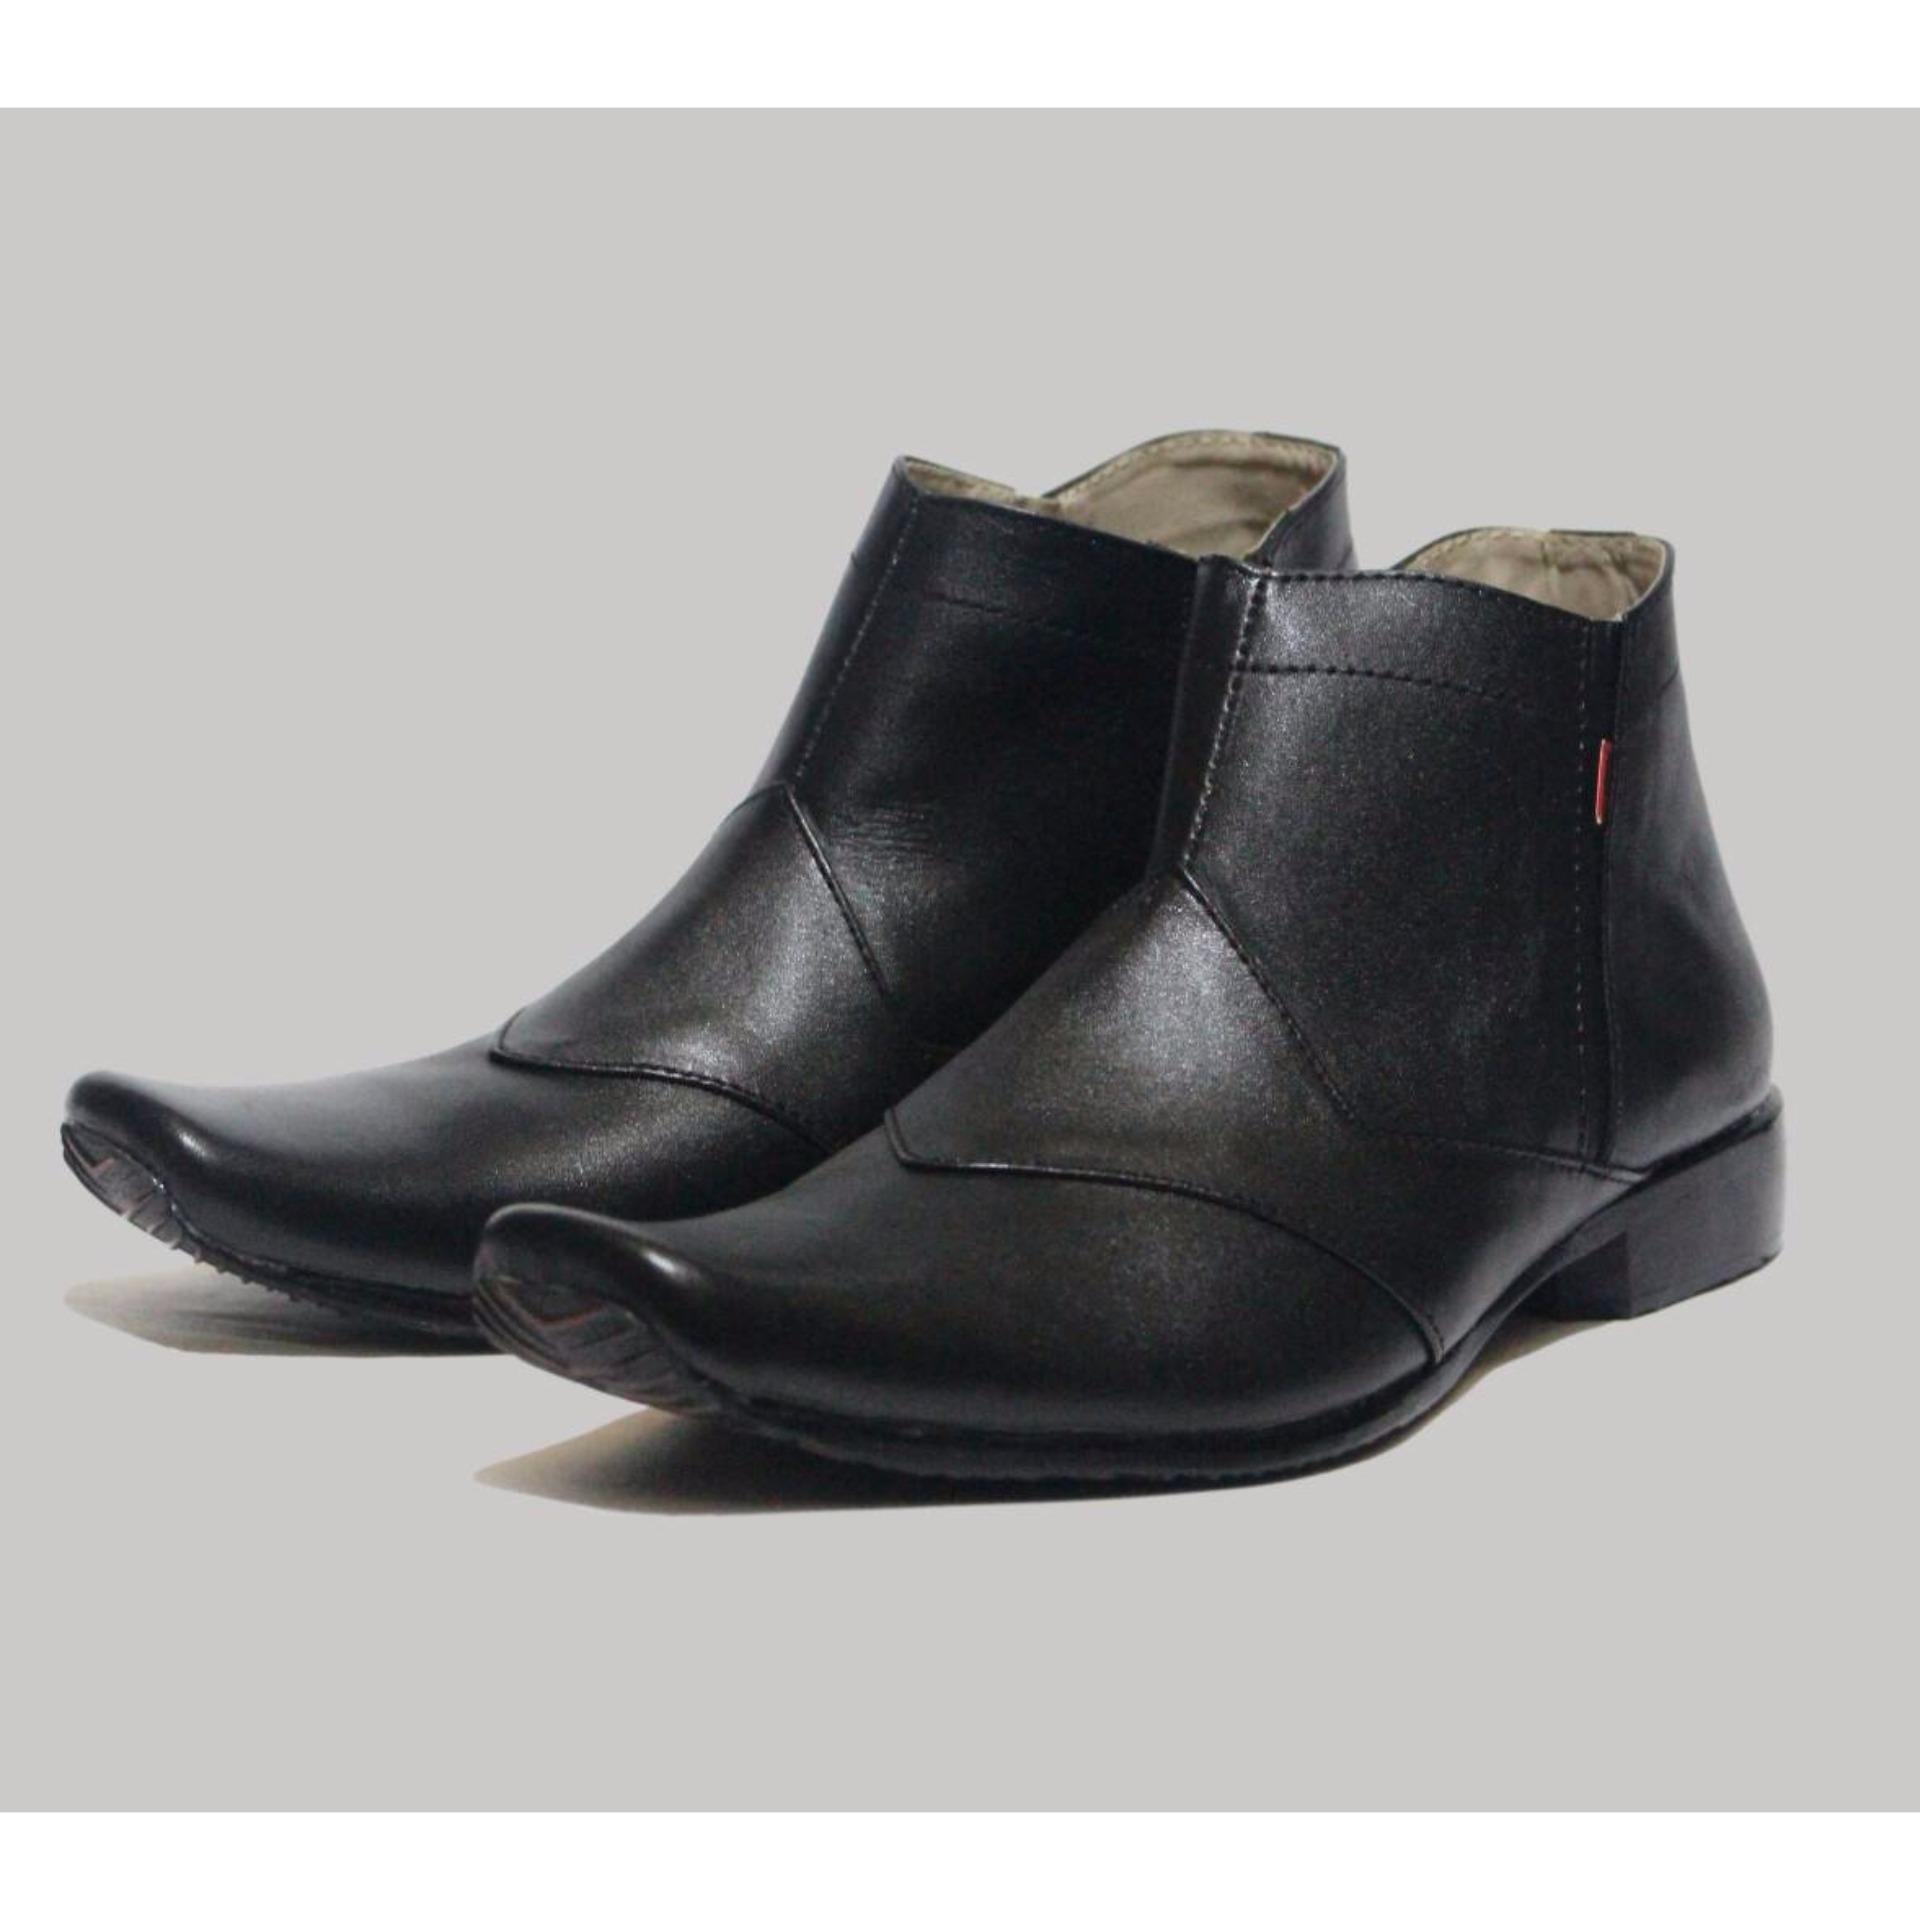 Harga Sepatu Cevany Pantopel Resleting Zipper Kulit Asli Hitam Baru